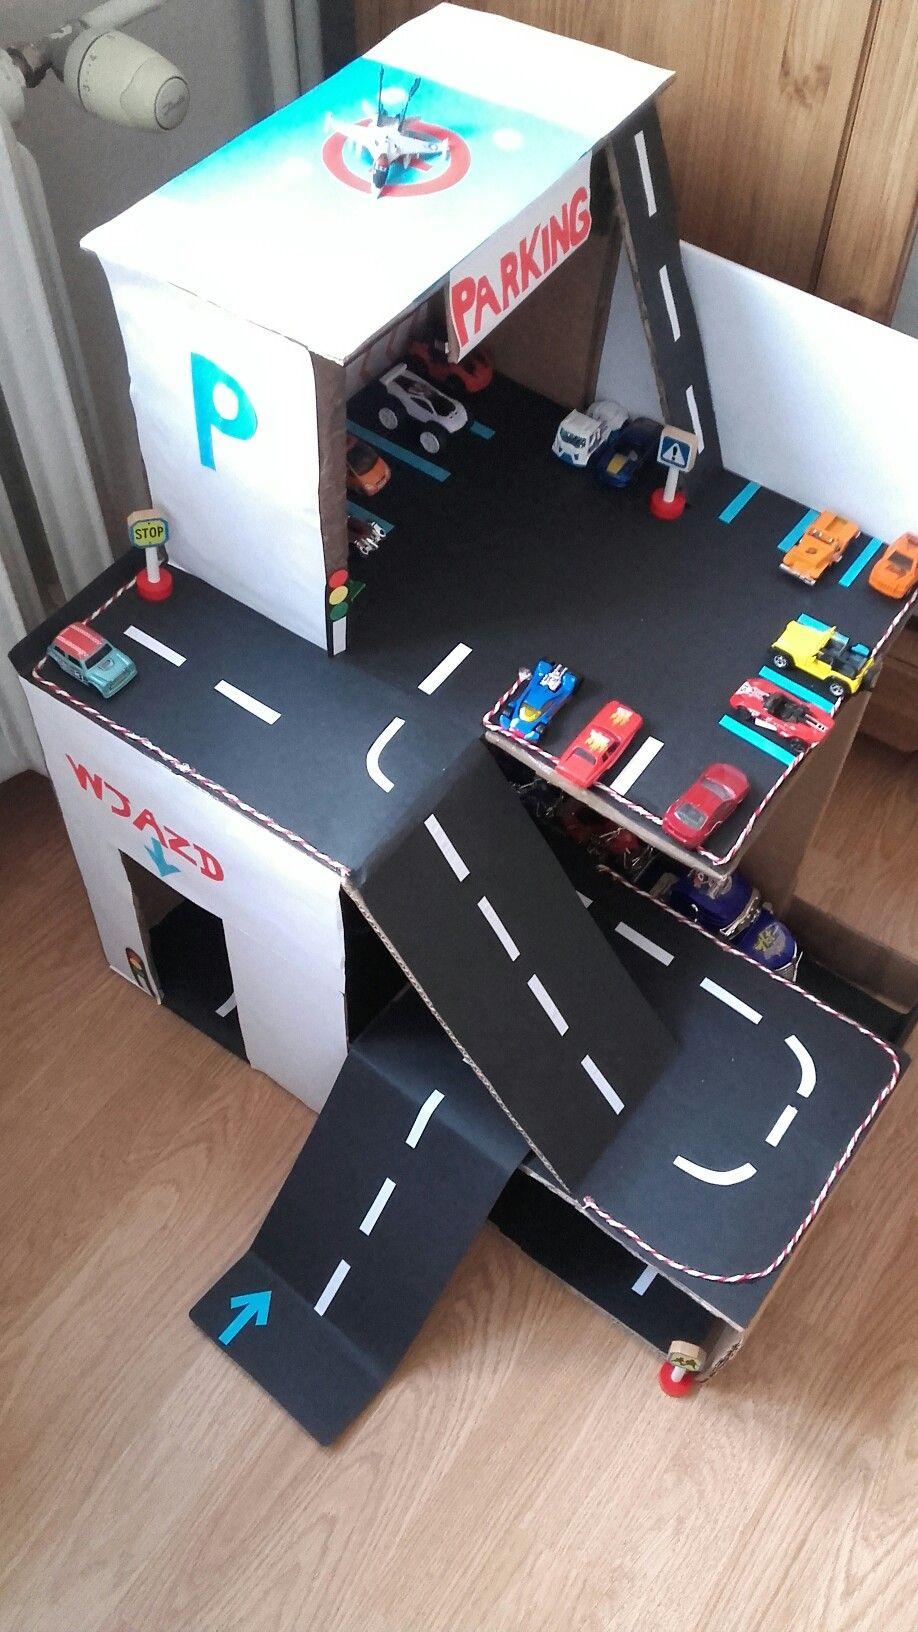 For By Cars Cardboard Parking Juguetes IscraftDiyManualidades 2eW9YEDHI